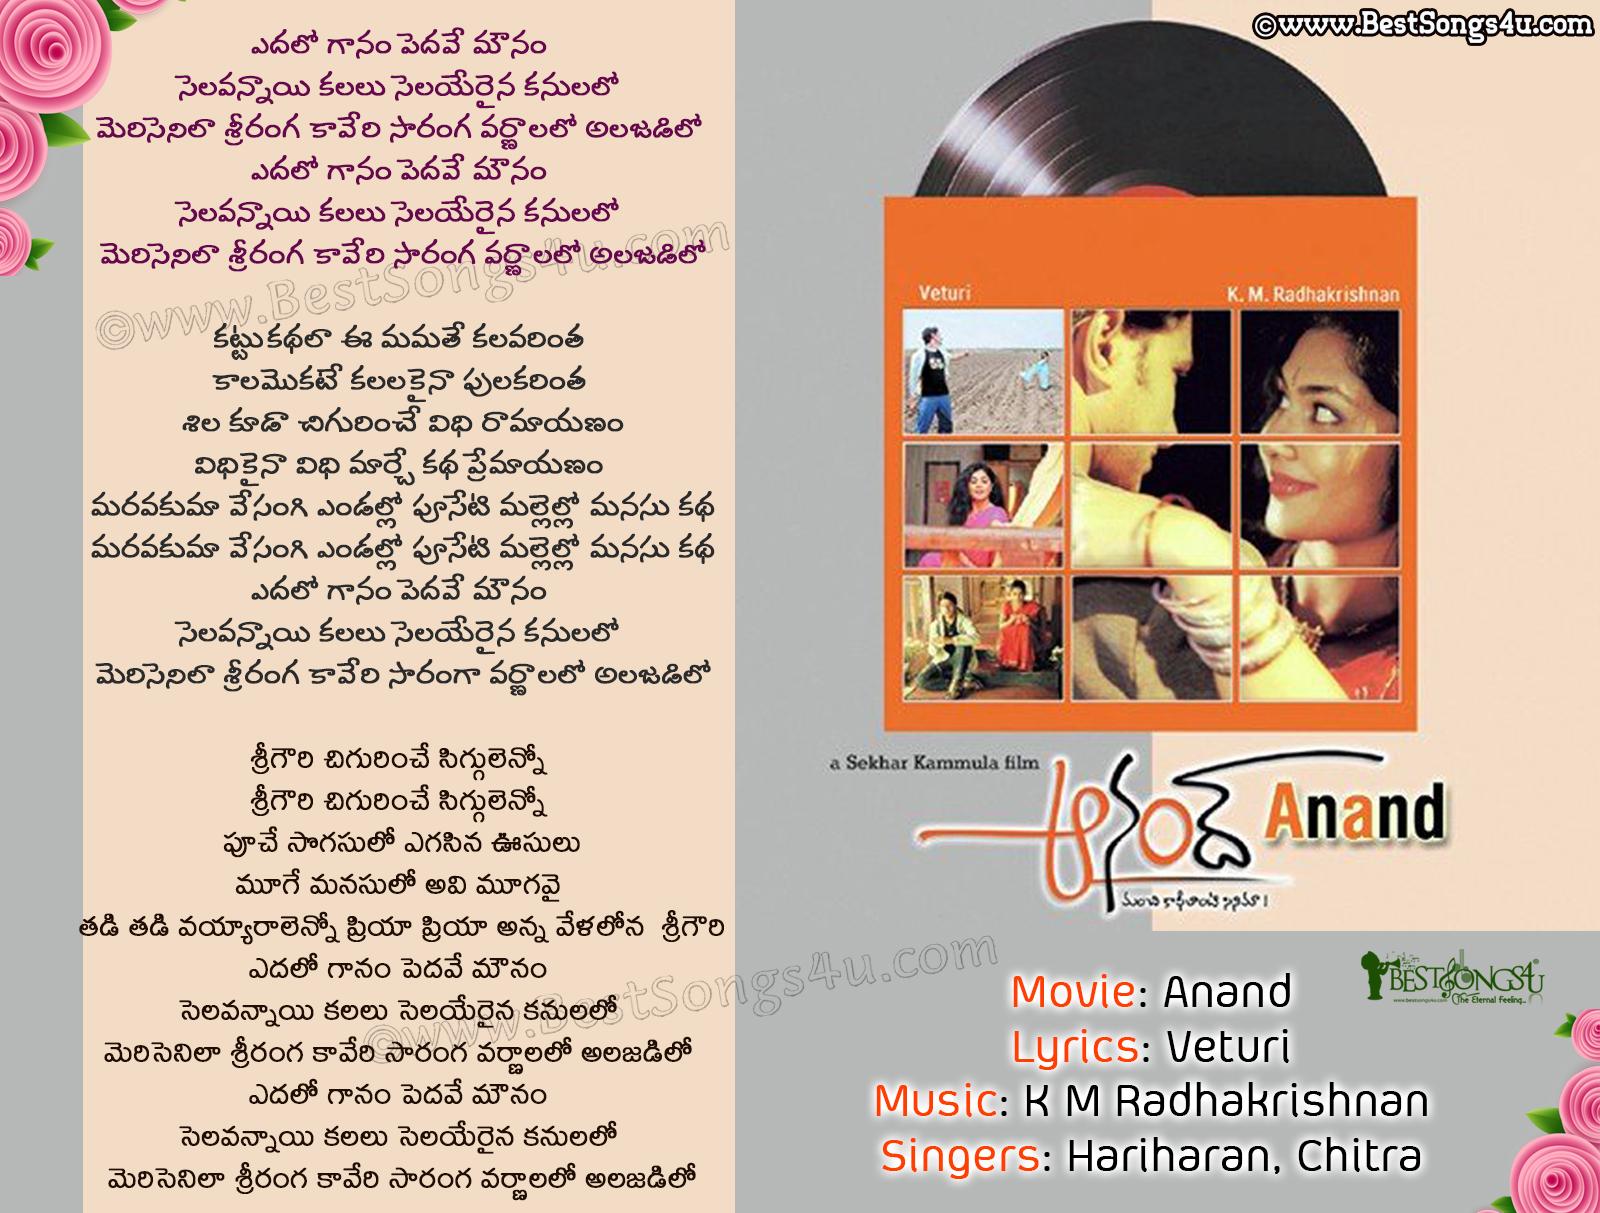 Old is Gold Hindi Songs - Selected Old Hindi movie song